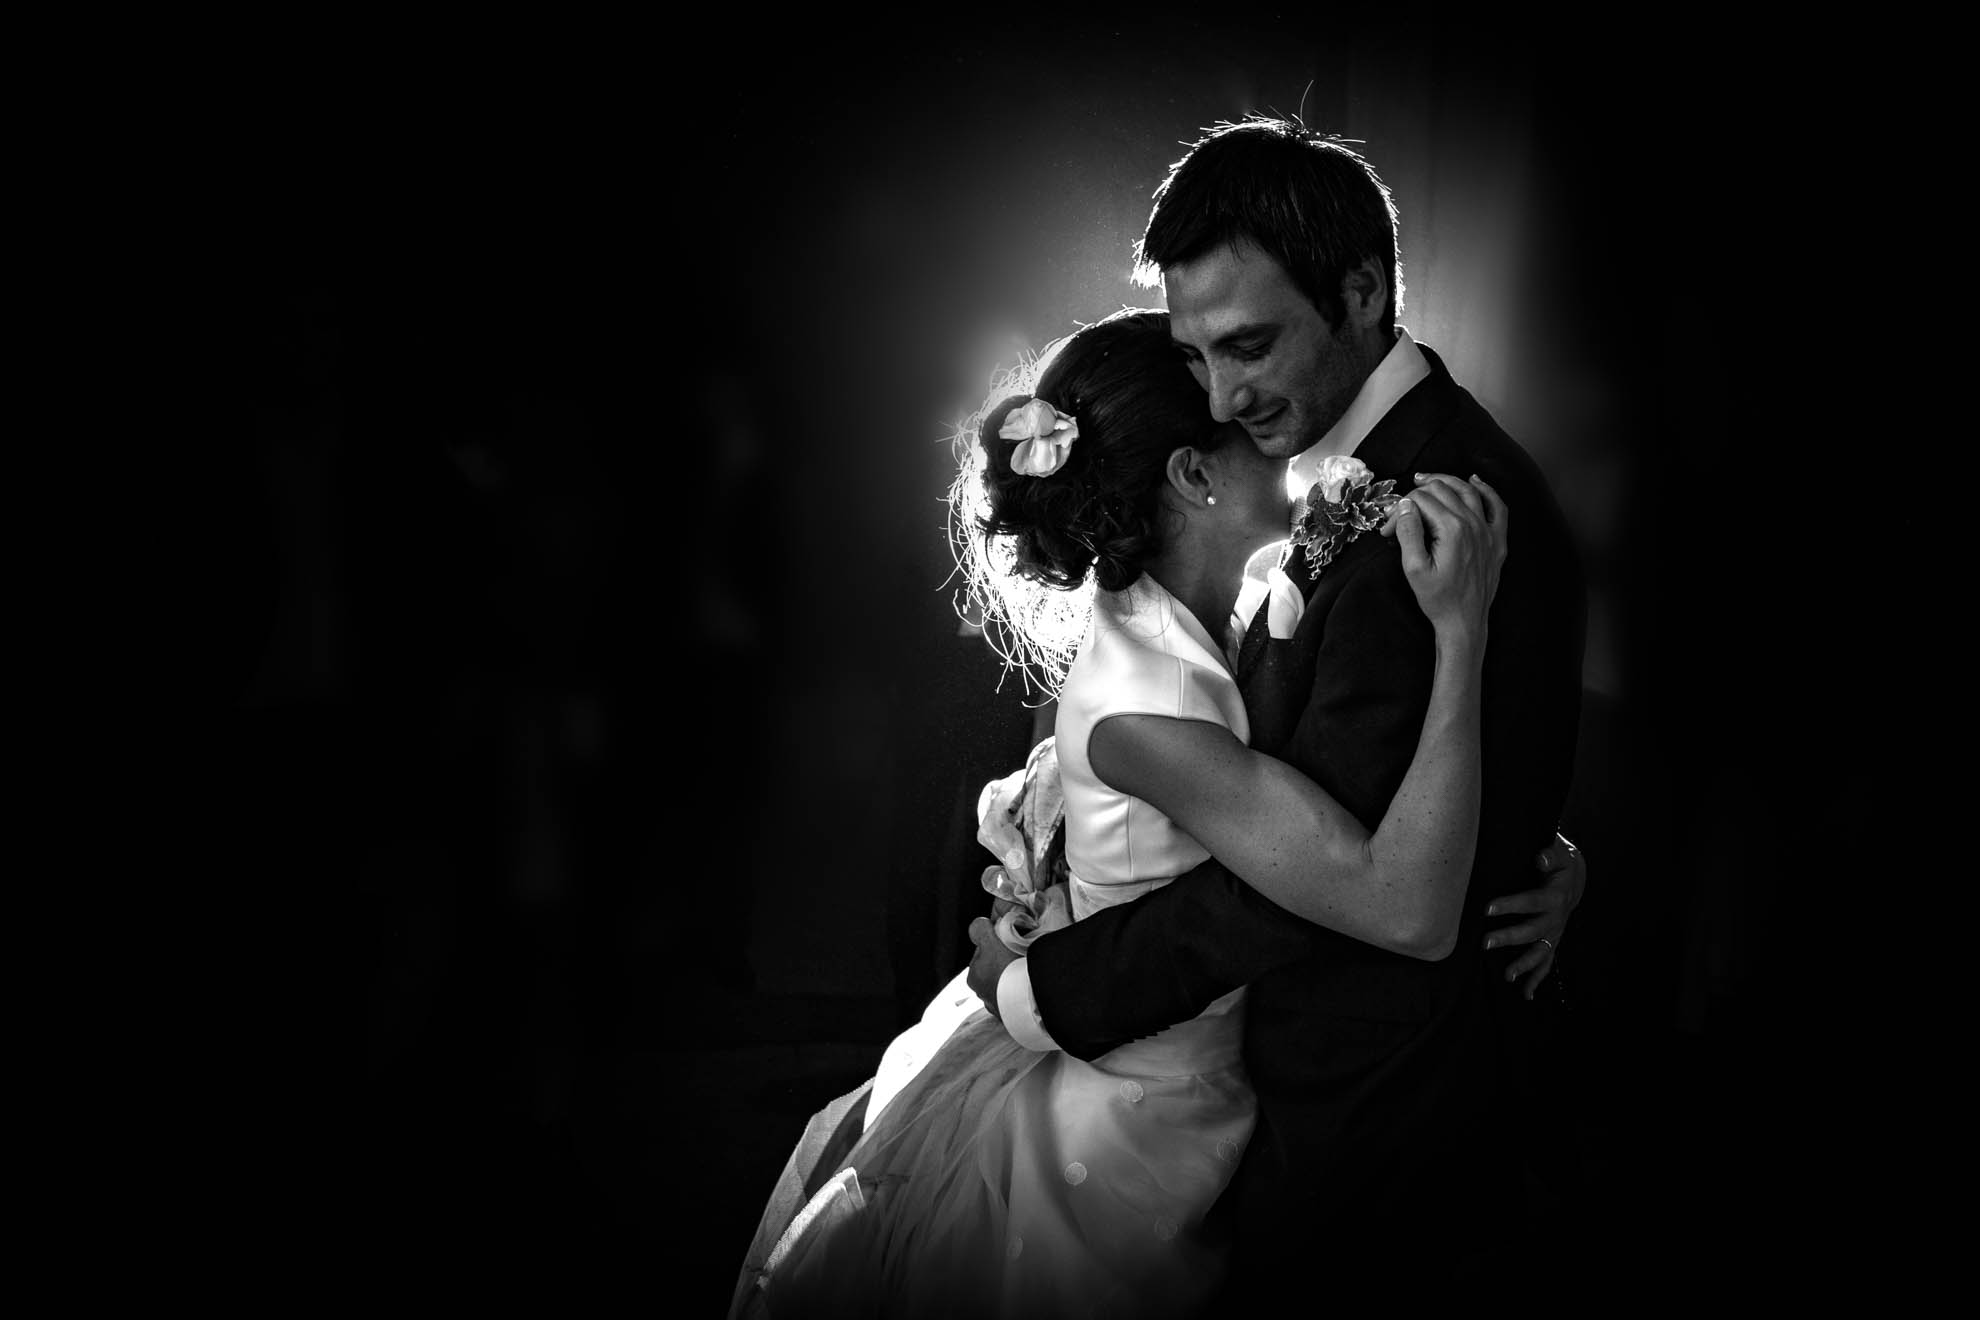 002 Fotografo per Matrimonio Diego Ravenna PaviaIMG_2882-2-2-Modifica